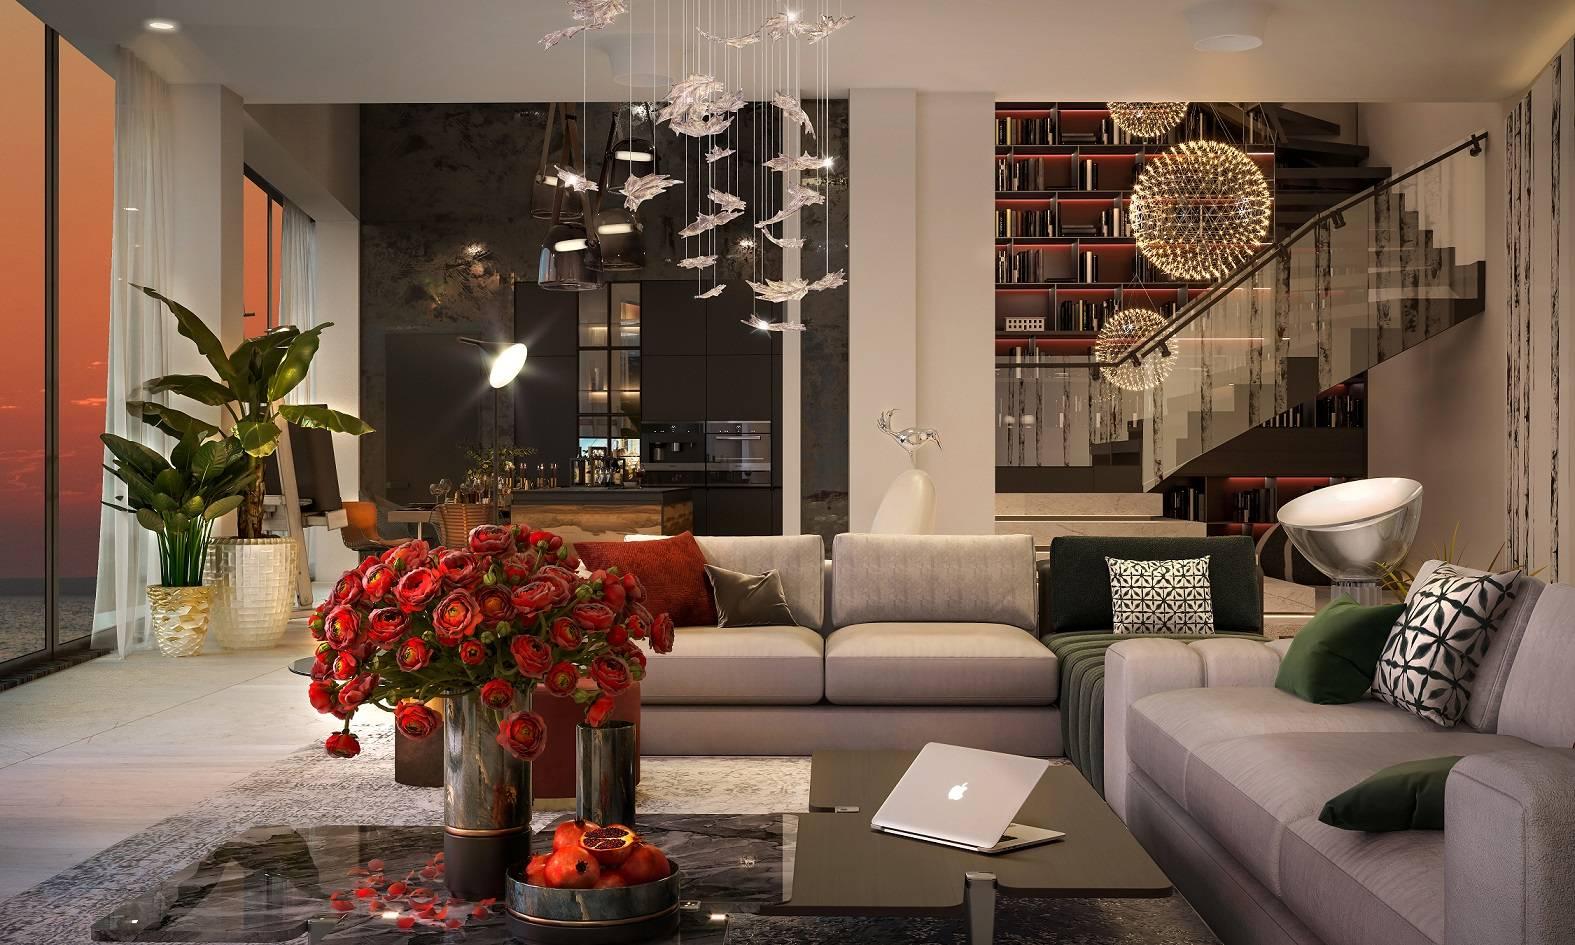 idei-dizajna-interera-kvartiry